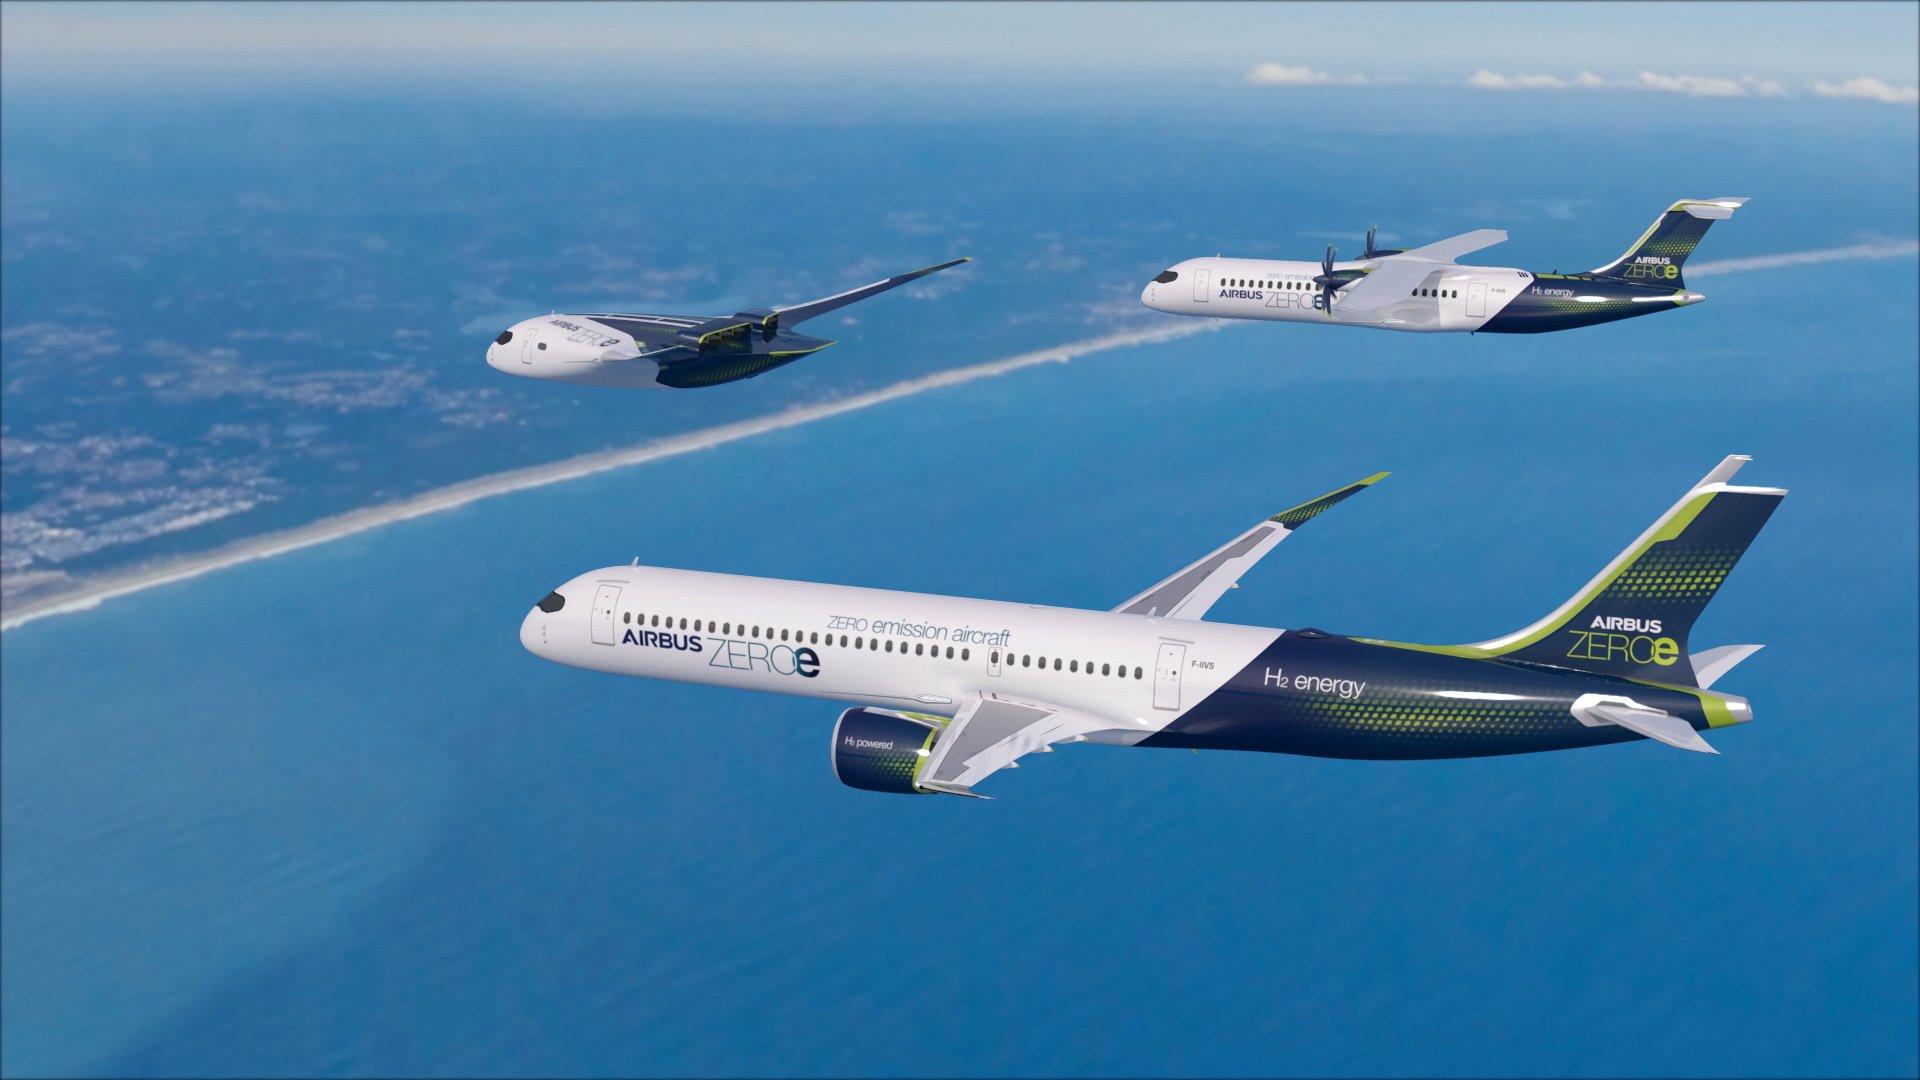 Концепт самолётов на водородном топливе компании Airbus